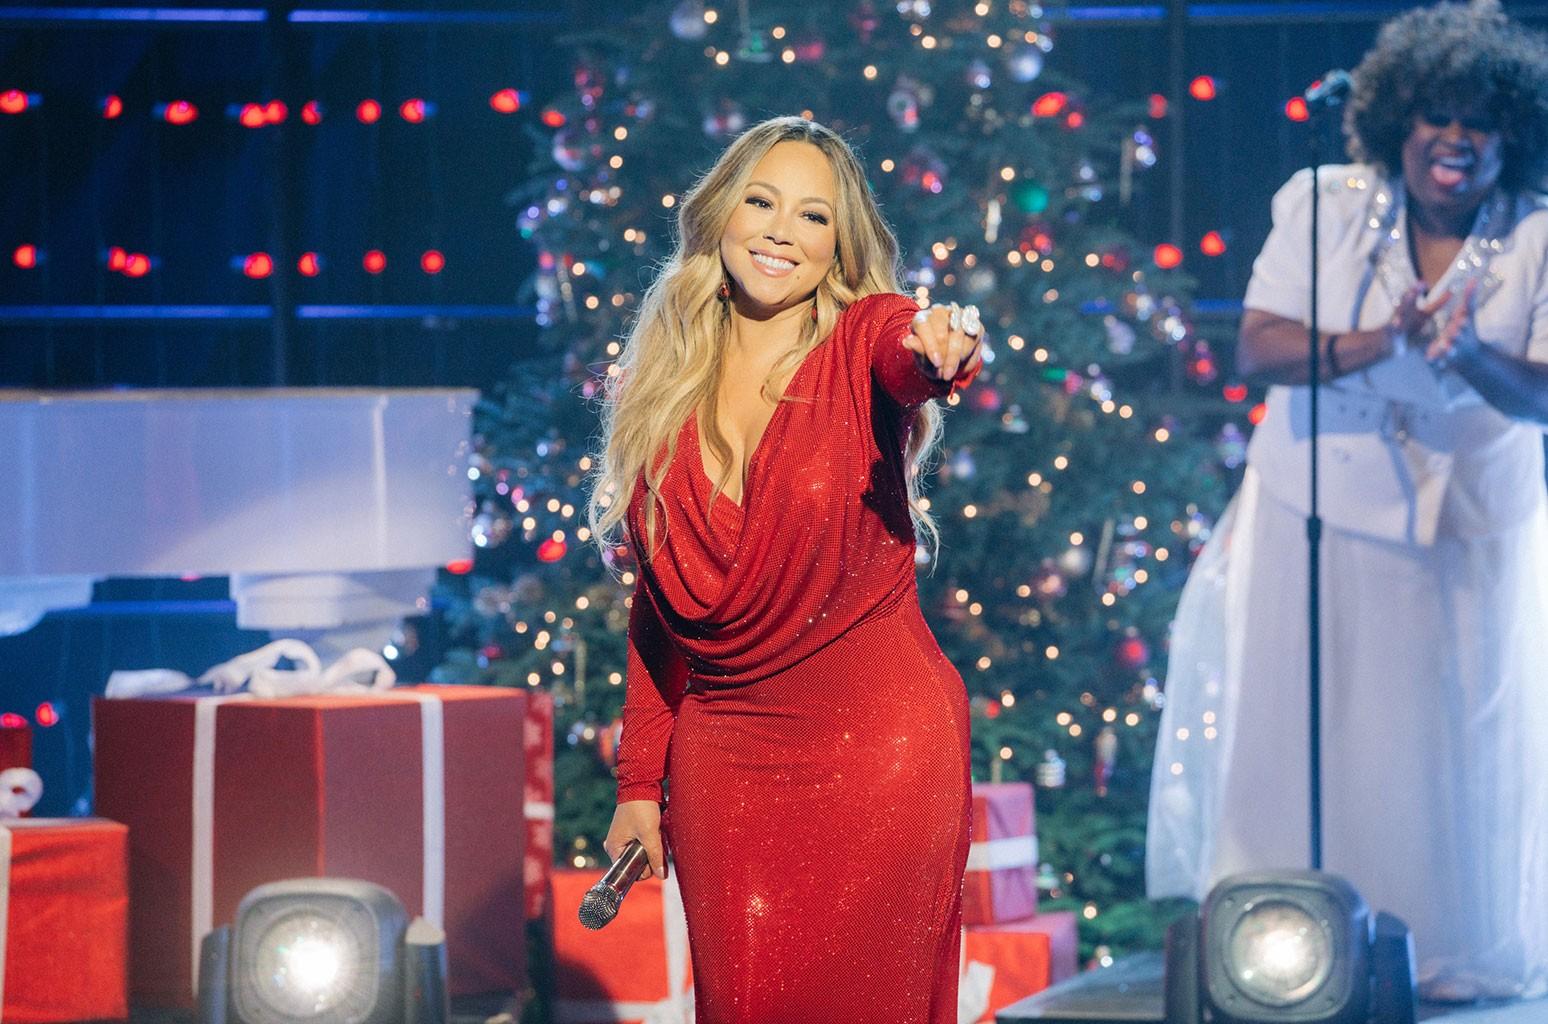 Christmas Invades Australia's Charts as Mariah Carey, Michael Buble Rule | Billboard